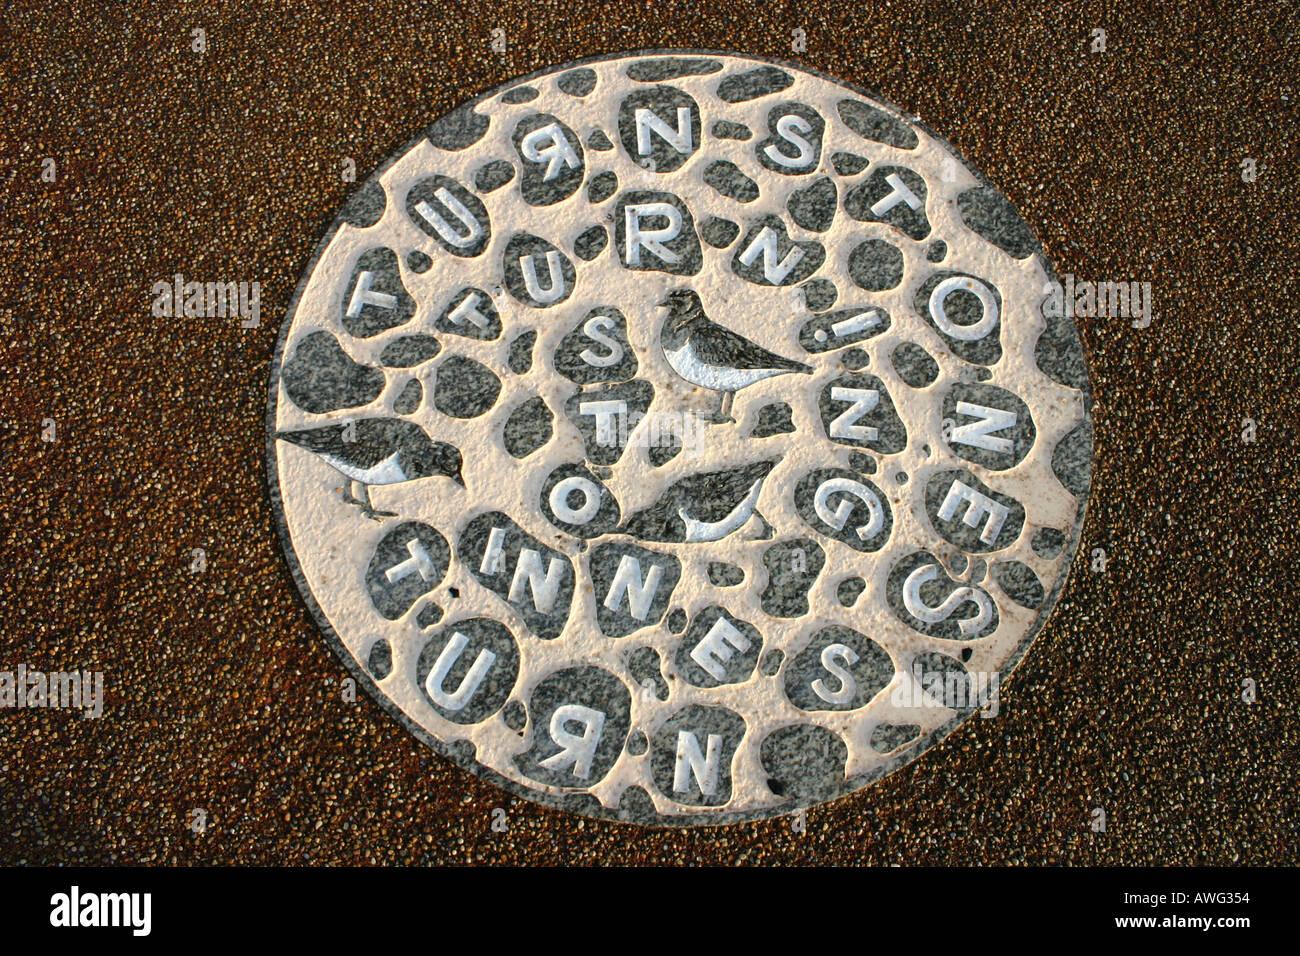 Art Work on flagstone Tern project Morecambe - Stock Image